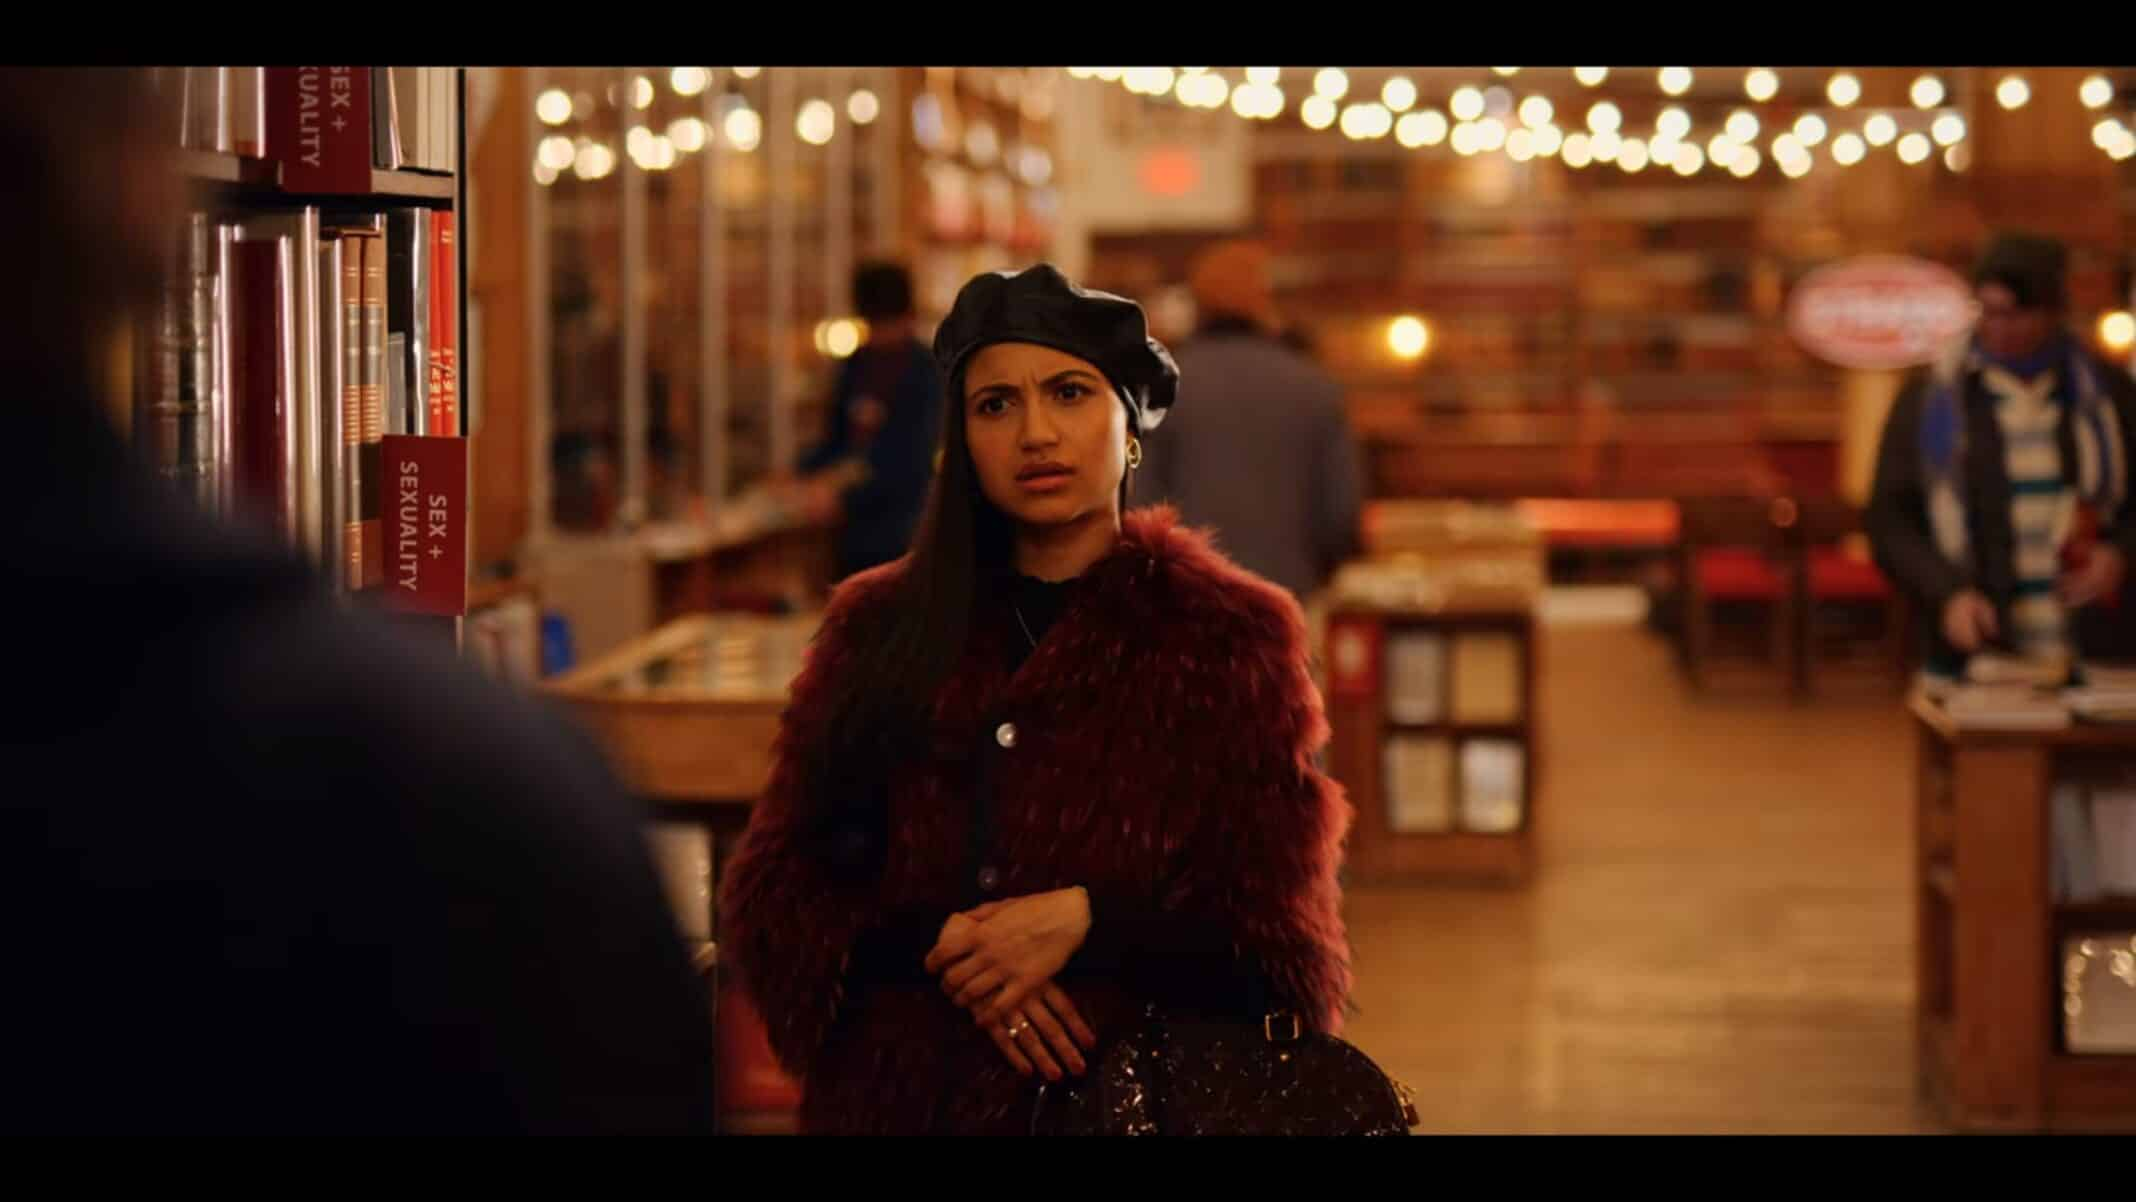 Priya (Agneeta Thacker) seeing Dash with a gay book in his hand